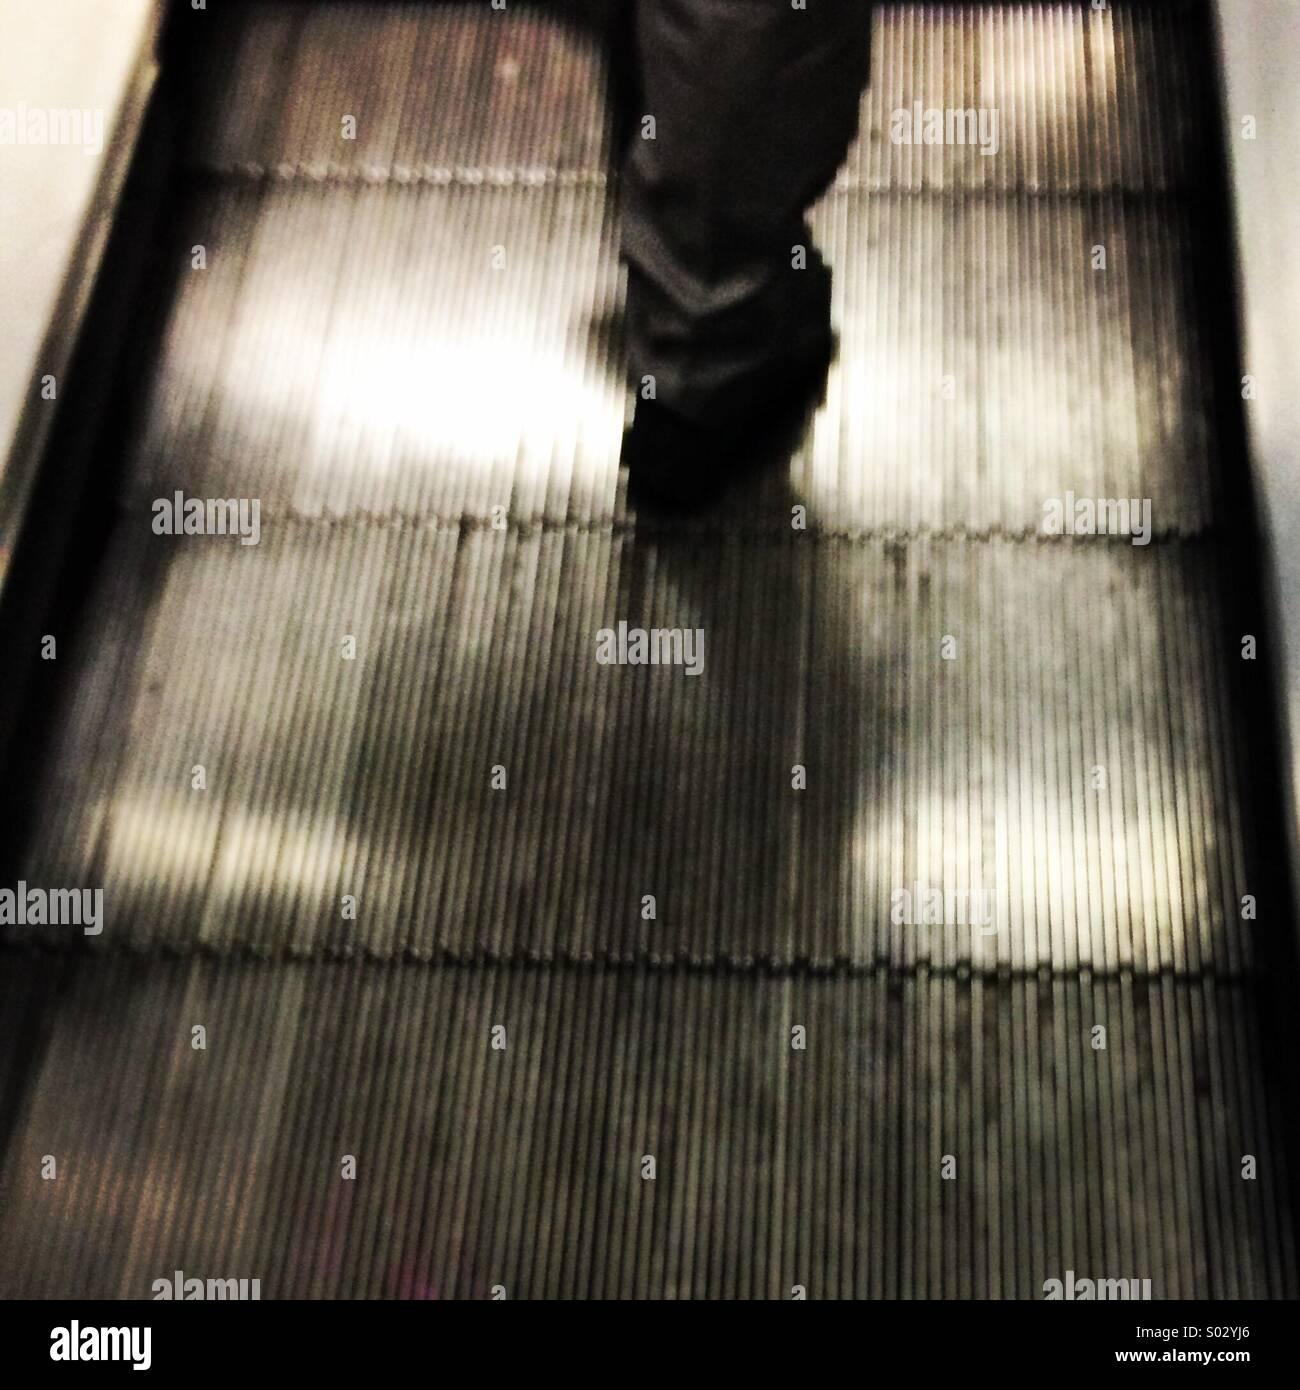 Blurred legs walking on a travelator escalator. - Stock Image